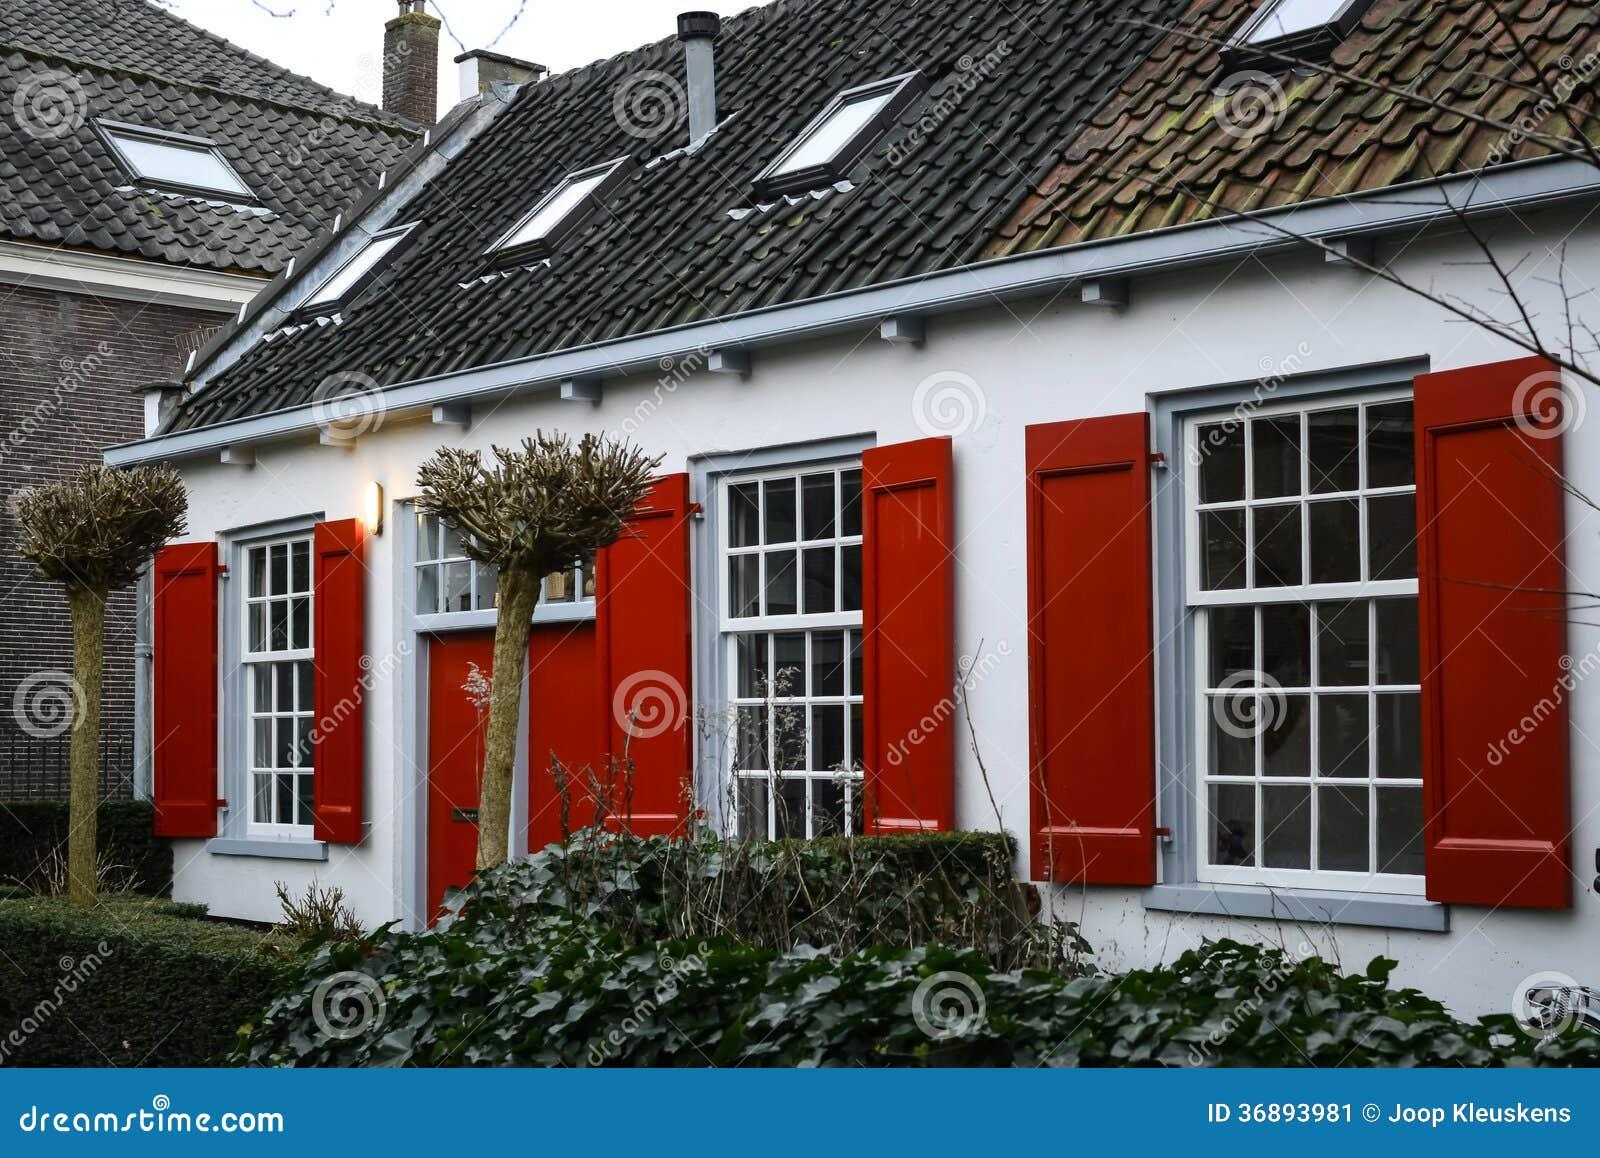 haus mit roten fensterl den stockbild bild 36893981. Black Bedroom Furniture Sets. Home Design Ideas